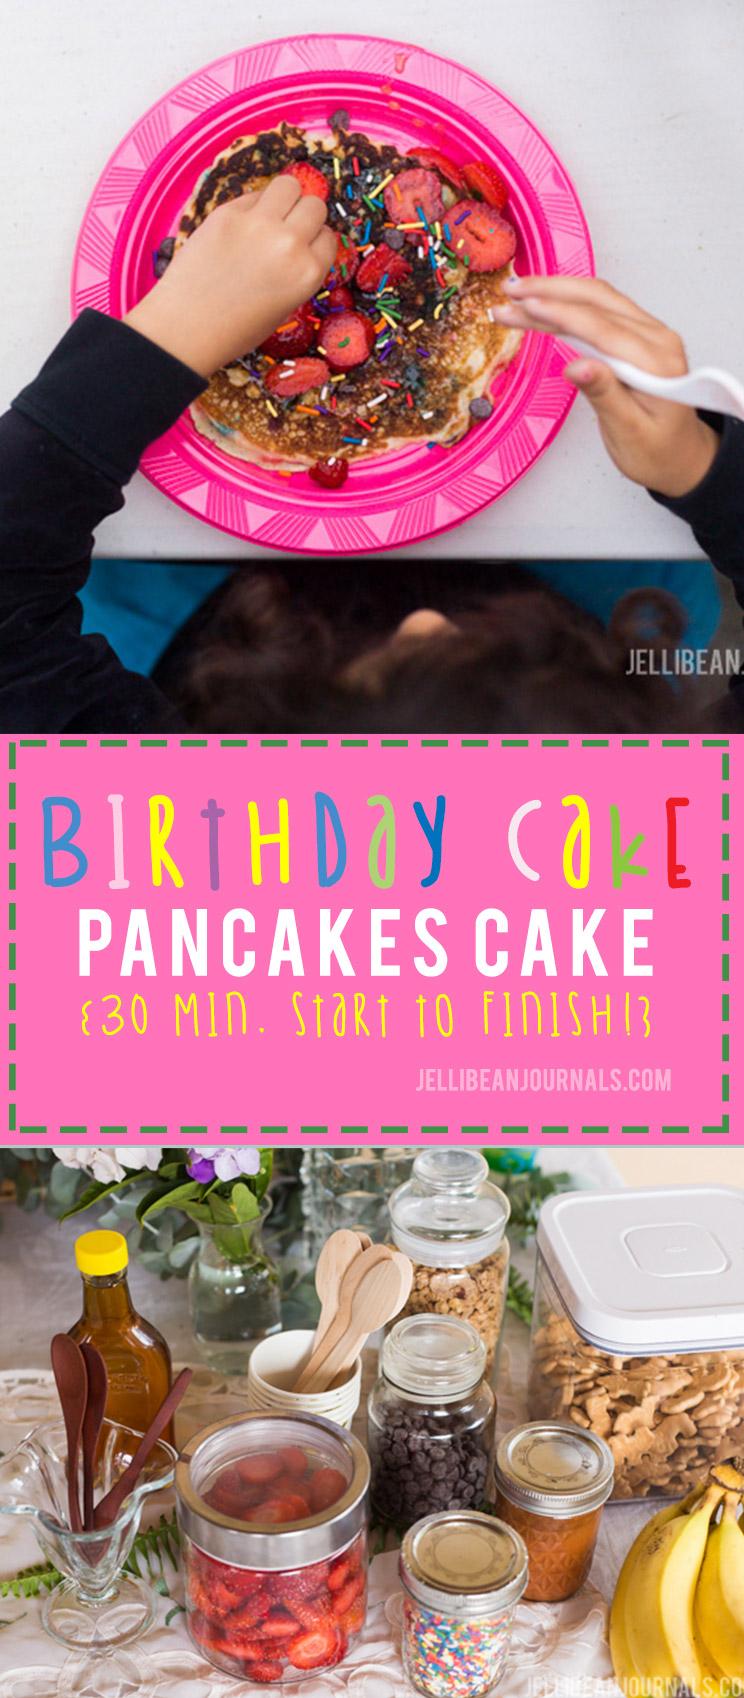 Sensational Birthday Cake Pancakes Cake from Jellibeanjournals.com